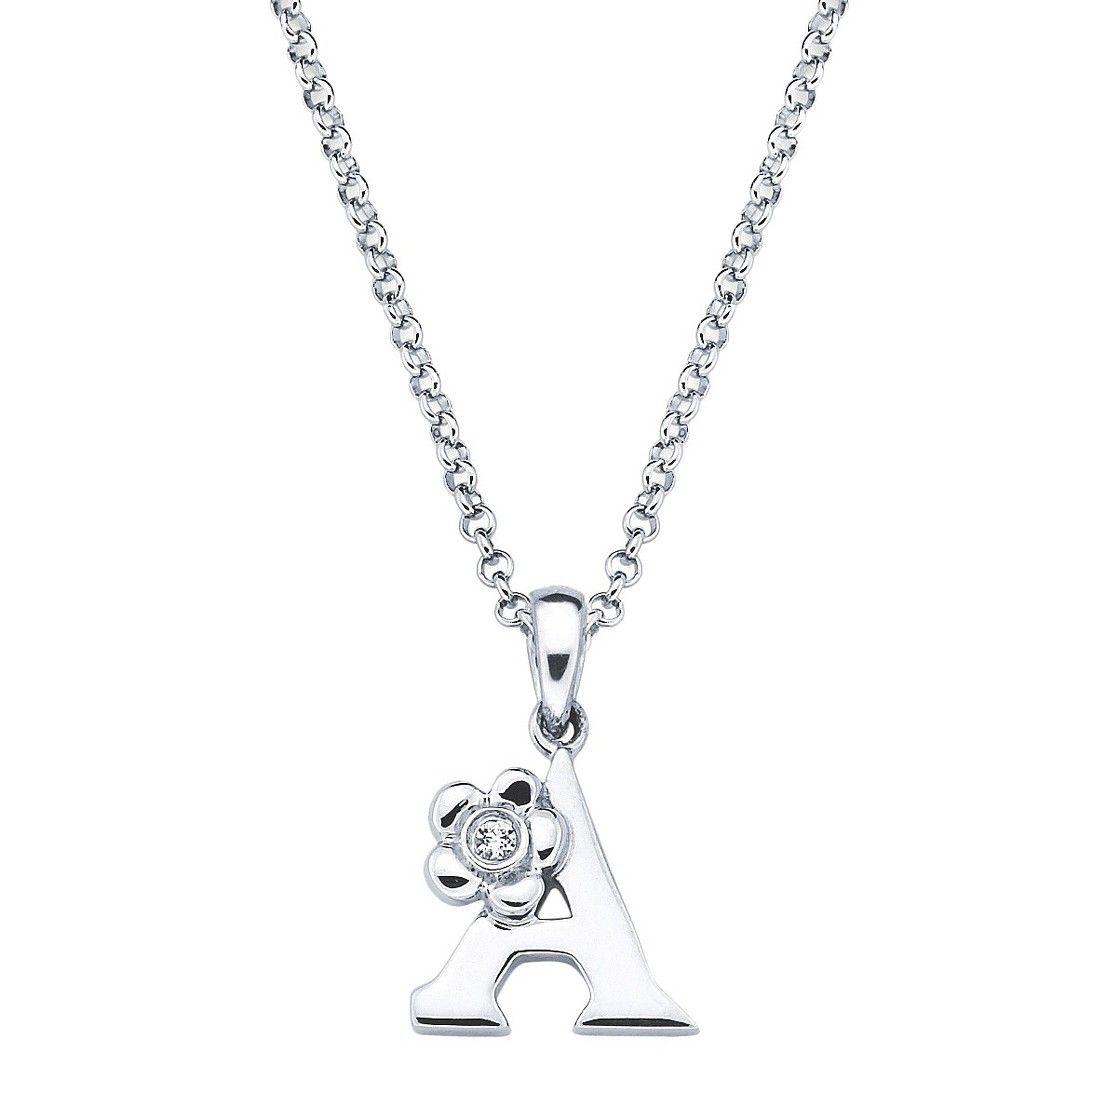 33+ Diamond letter pendant necklace ideas in 2021